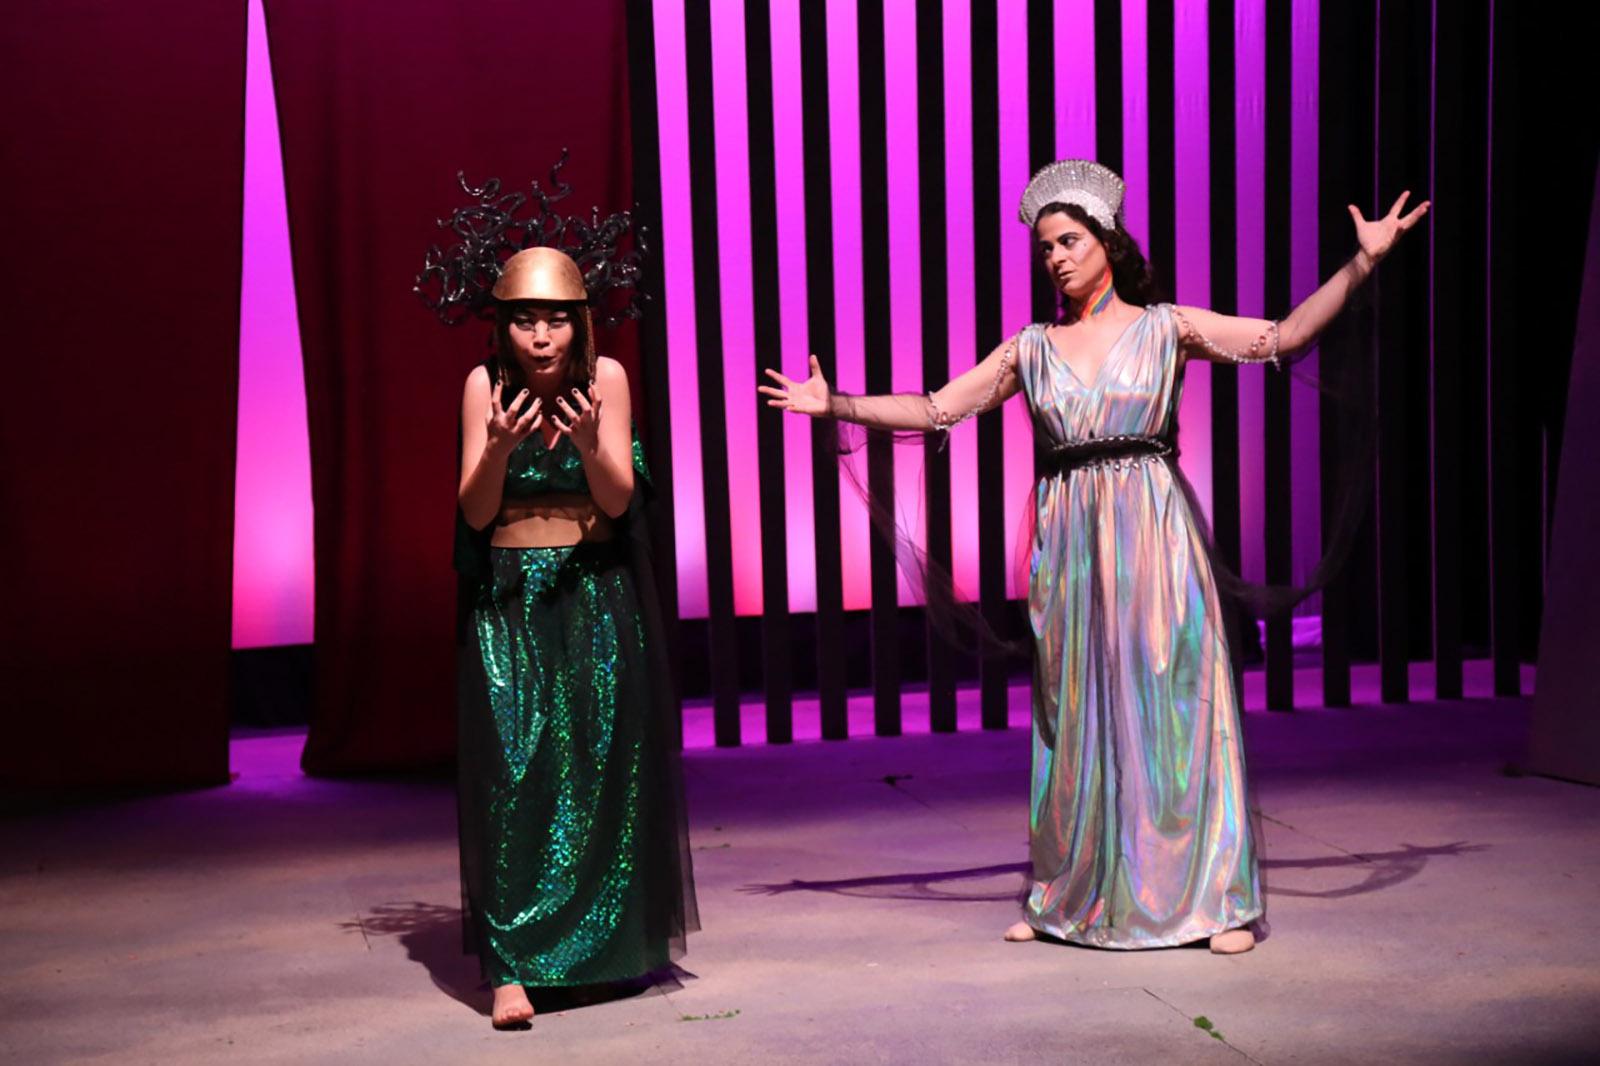 Yilin Liu as Lyssa and Darcy Krasne as Iris, in Herakles, 2019